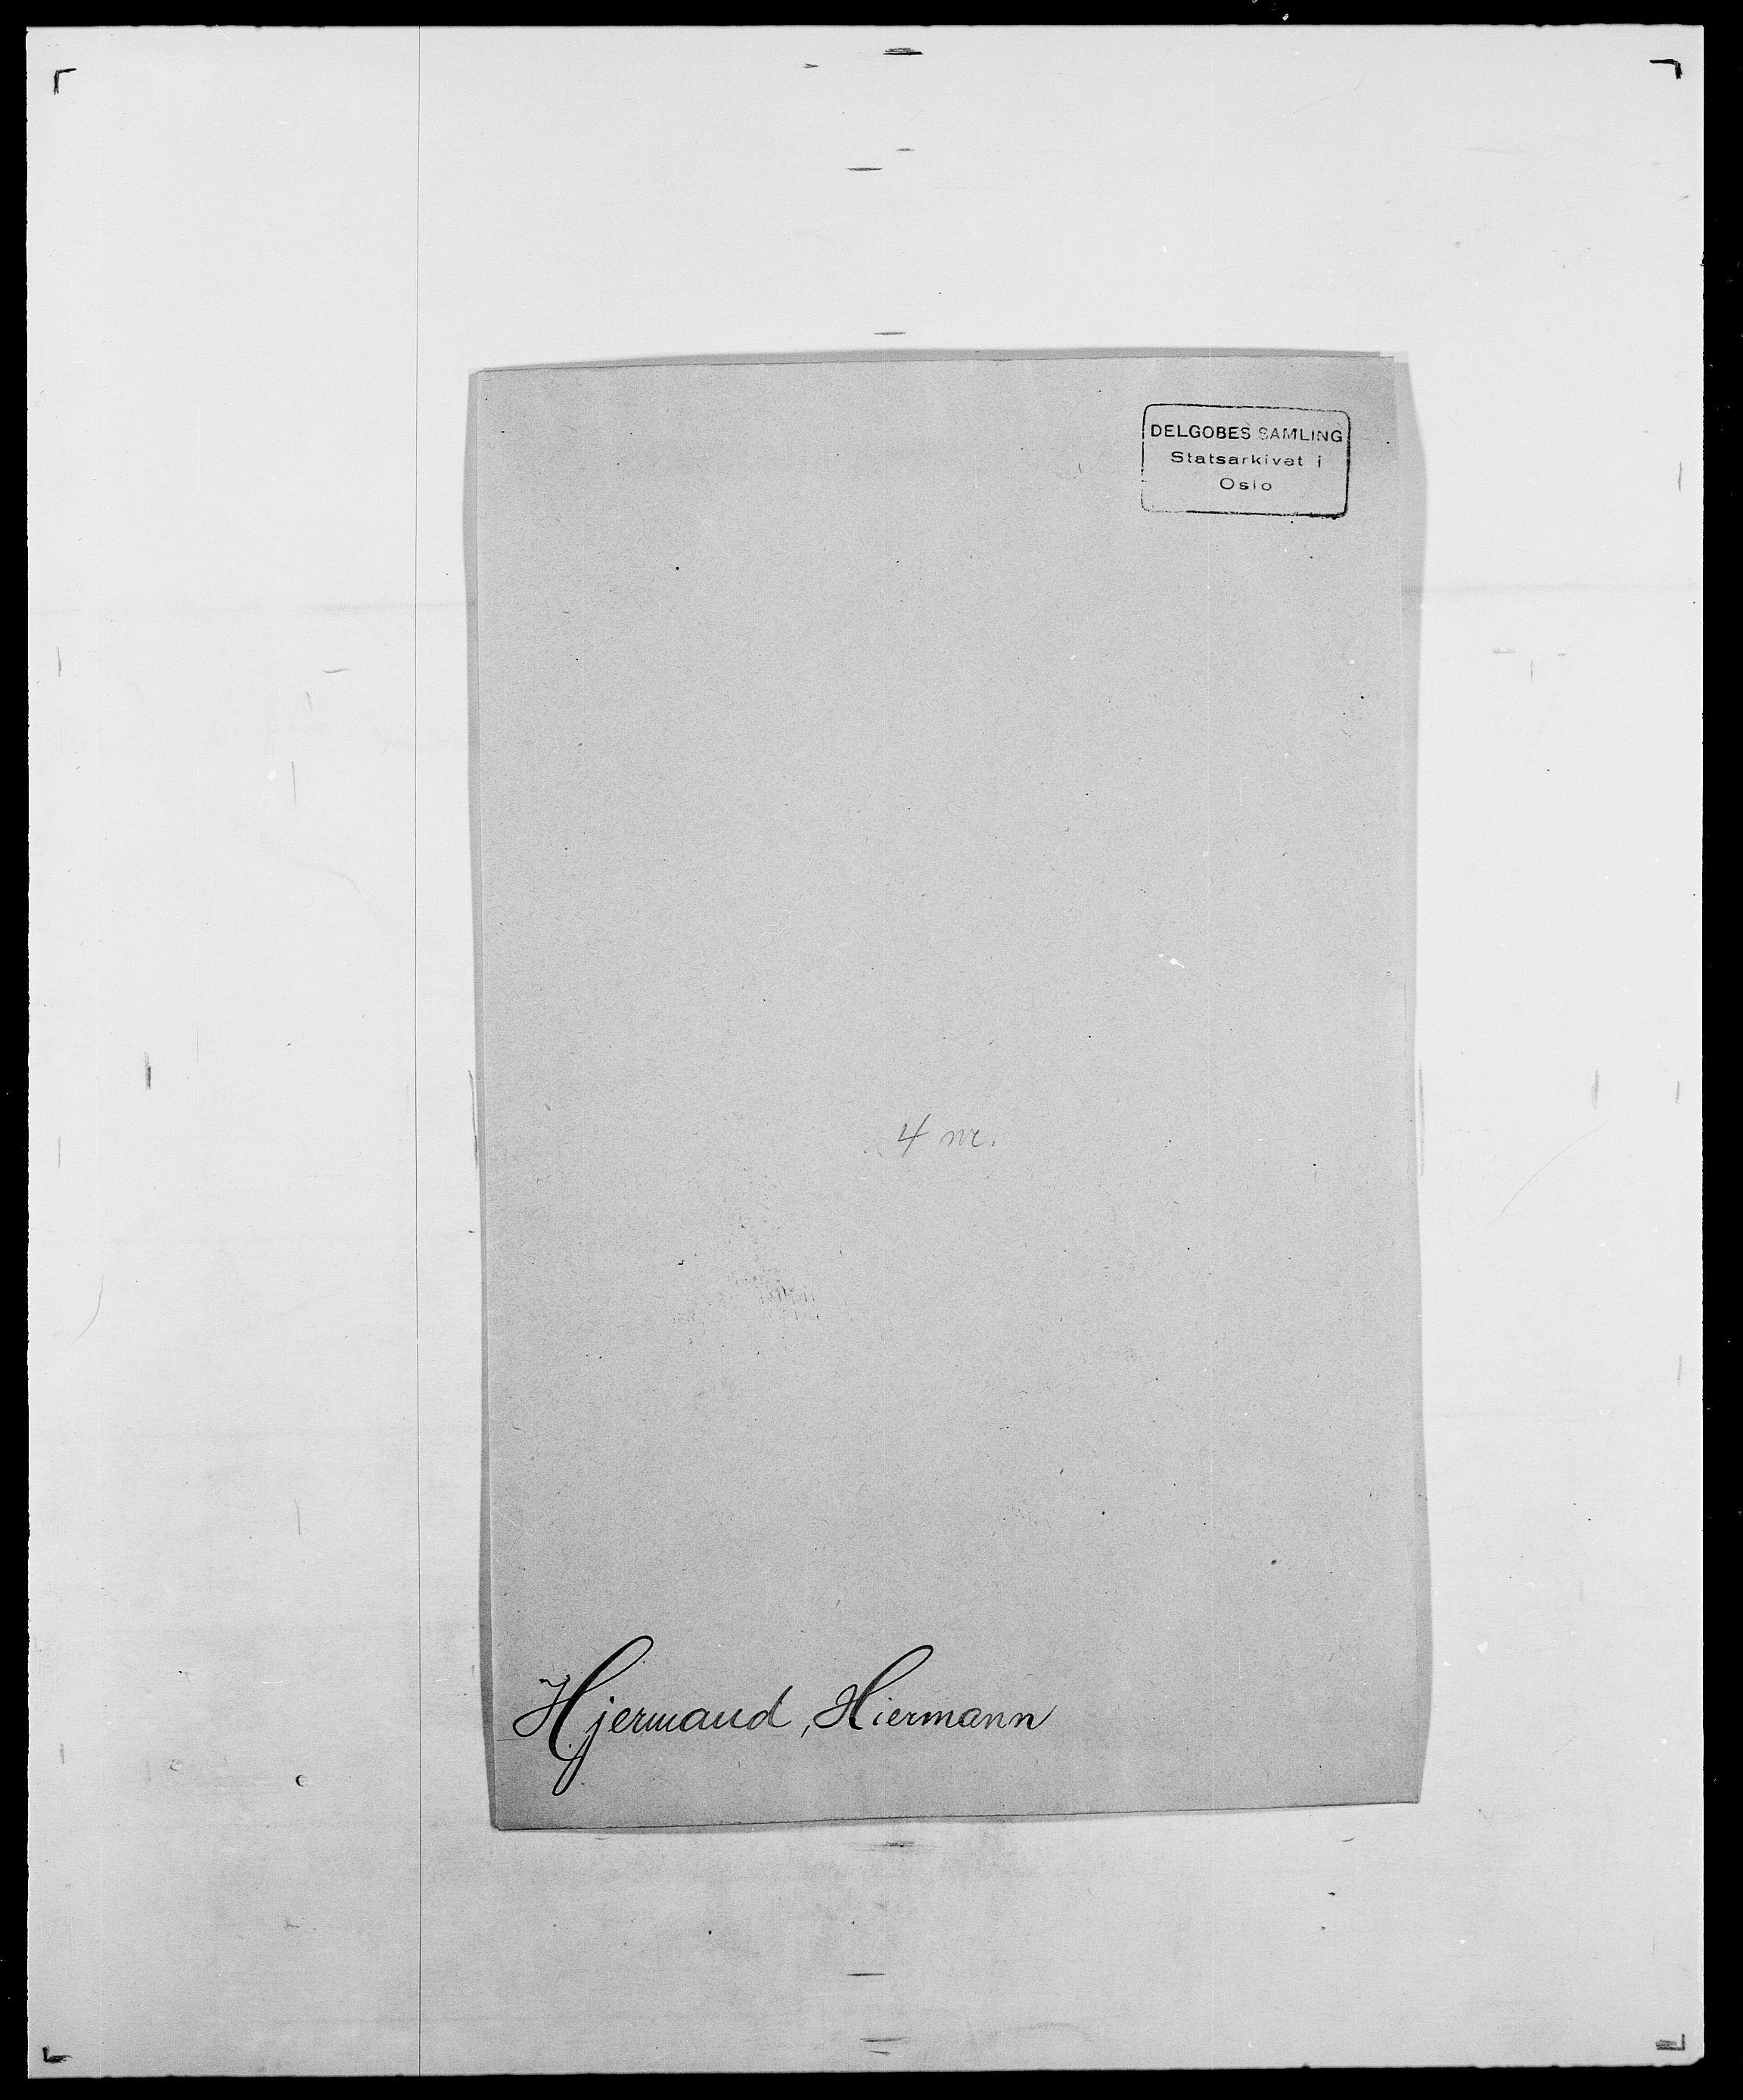 SAO, Delgobe, Charles Antoine - samling, D/Da/L0017: Helander - Hjørne, s. 544